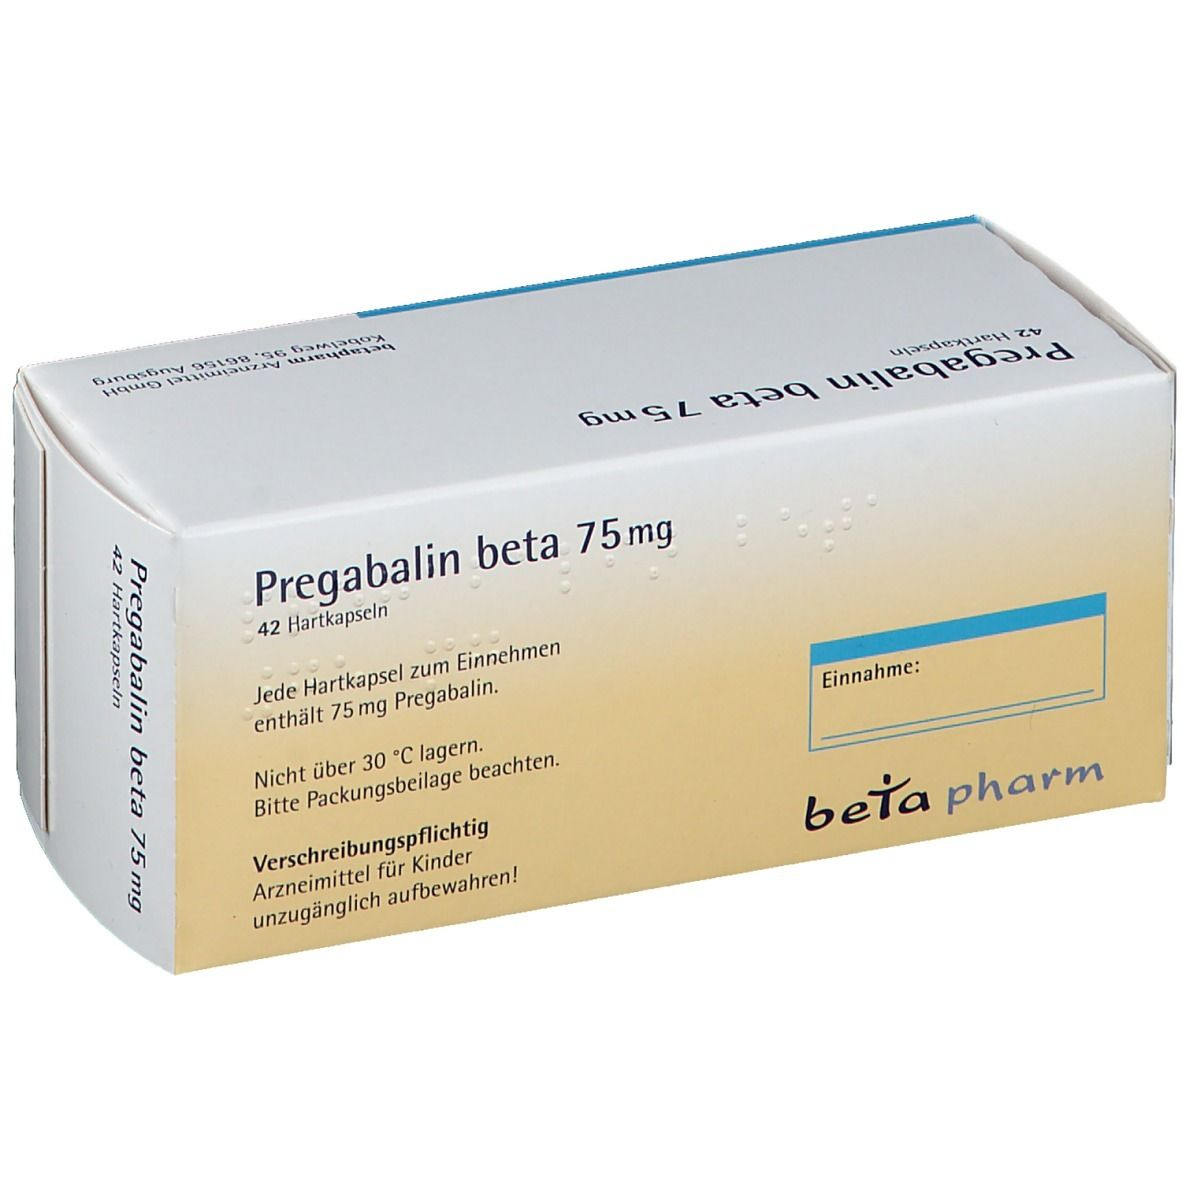 Pregabalin beta 75 mg